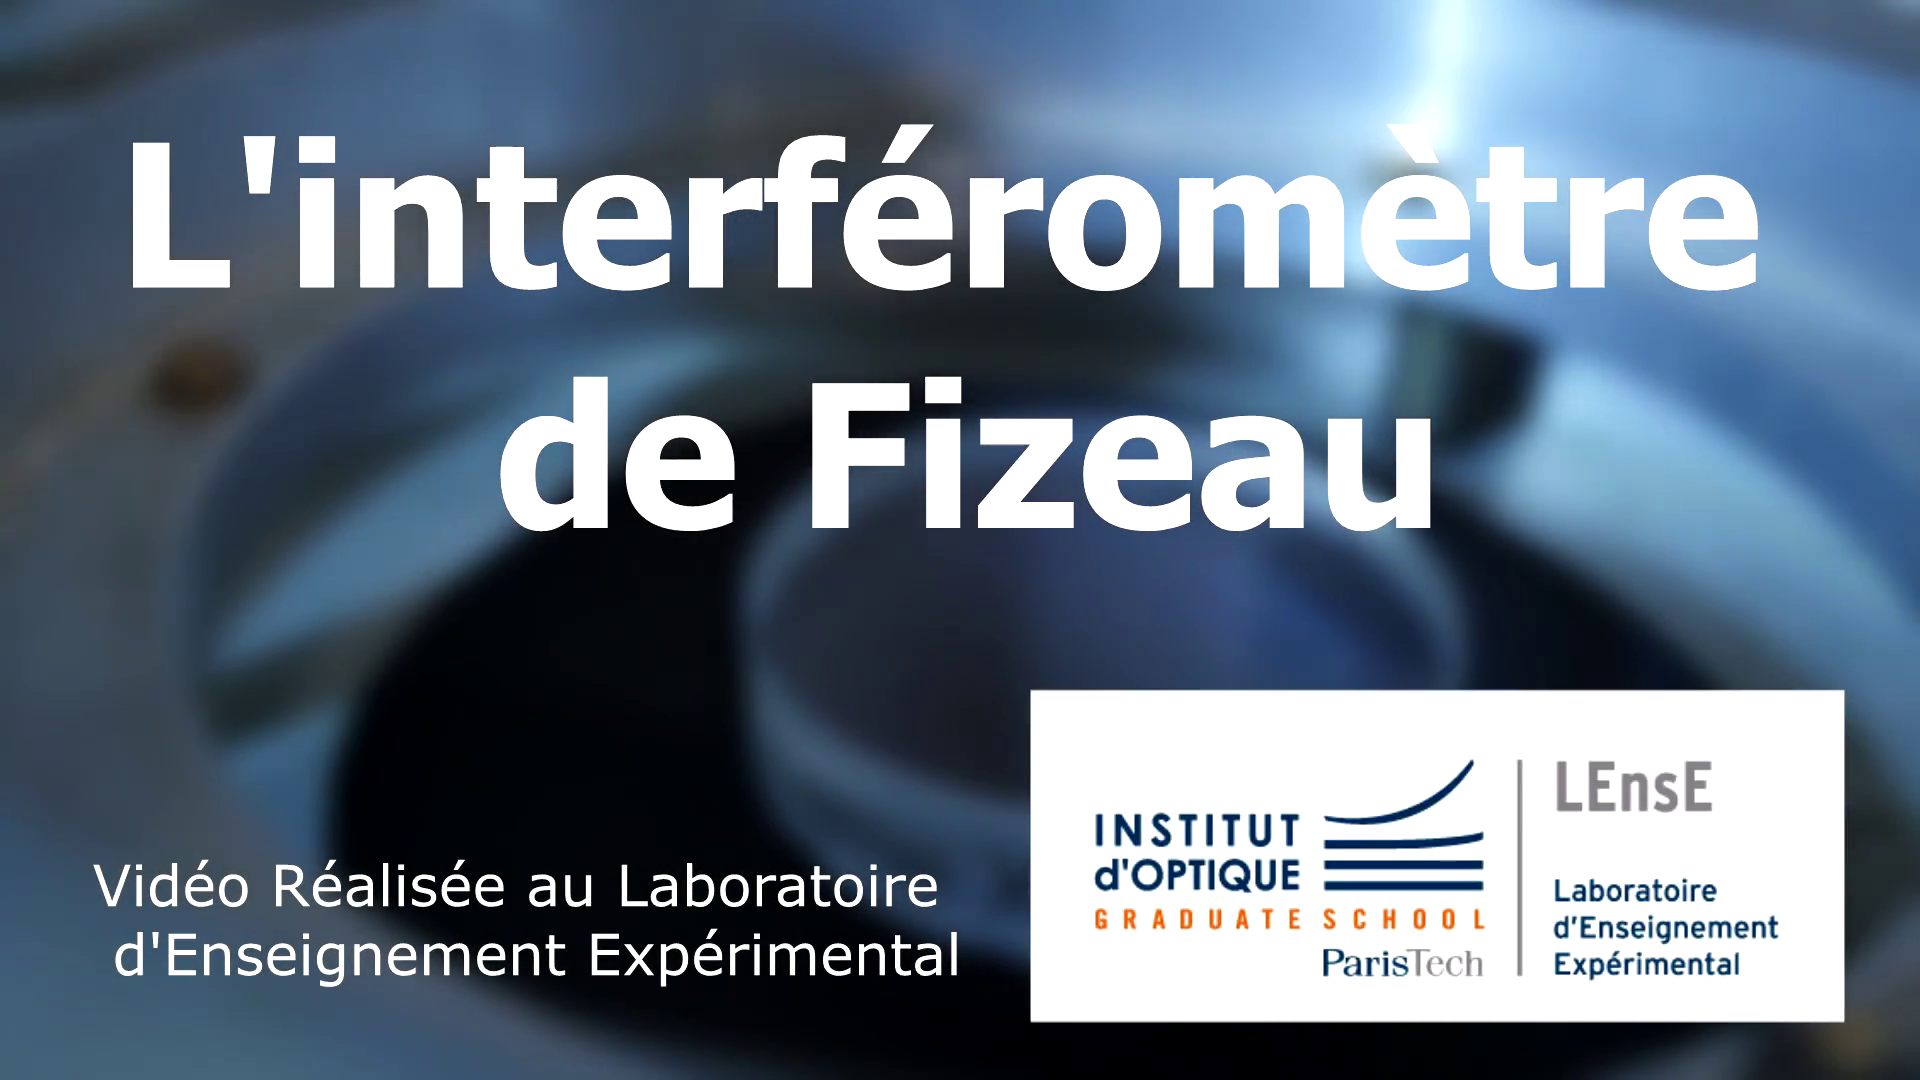 Interféromètre de Fizeau